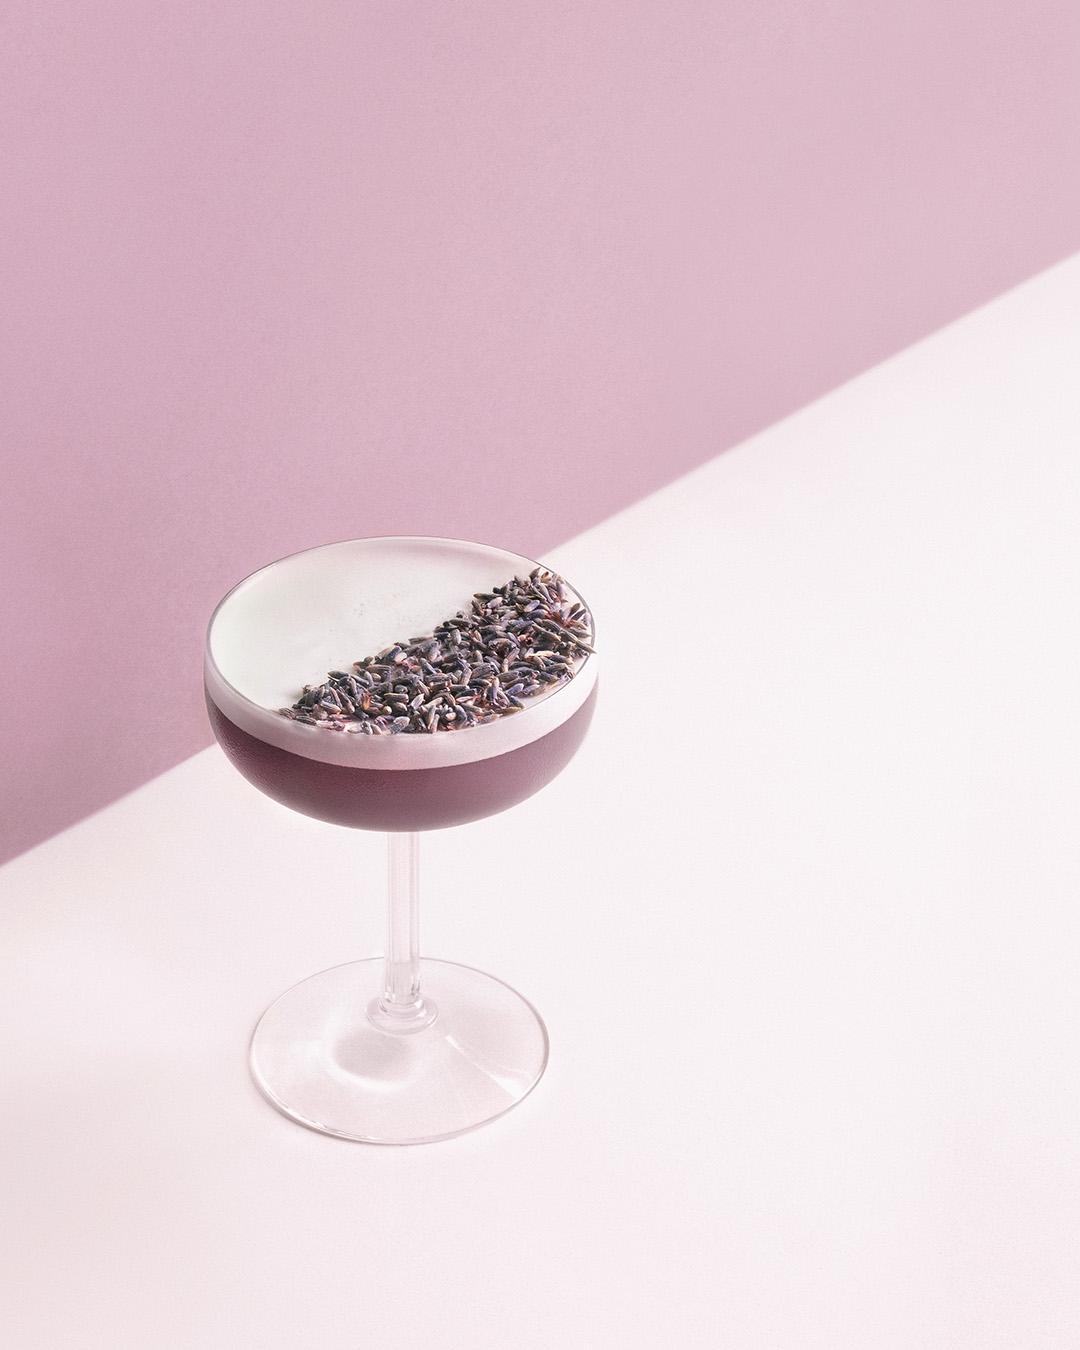 VIOLET FEMME   1½  oz  Pomp & Whimsy ½  oz  crème de violette/violet liqueur ½  oz  dry vermouth 1  tsp  grenadine 1  oz  egg white dried lavender buds   Dry shake, wet shake, strain.    Garnish with lavender buds.